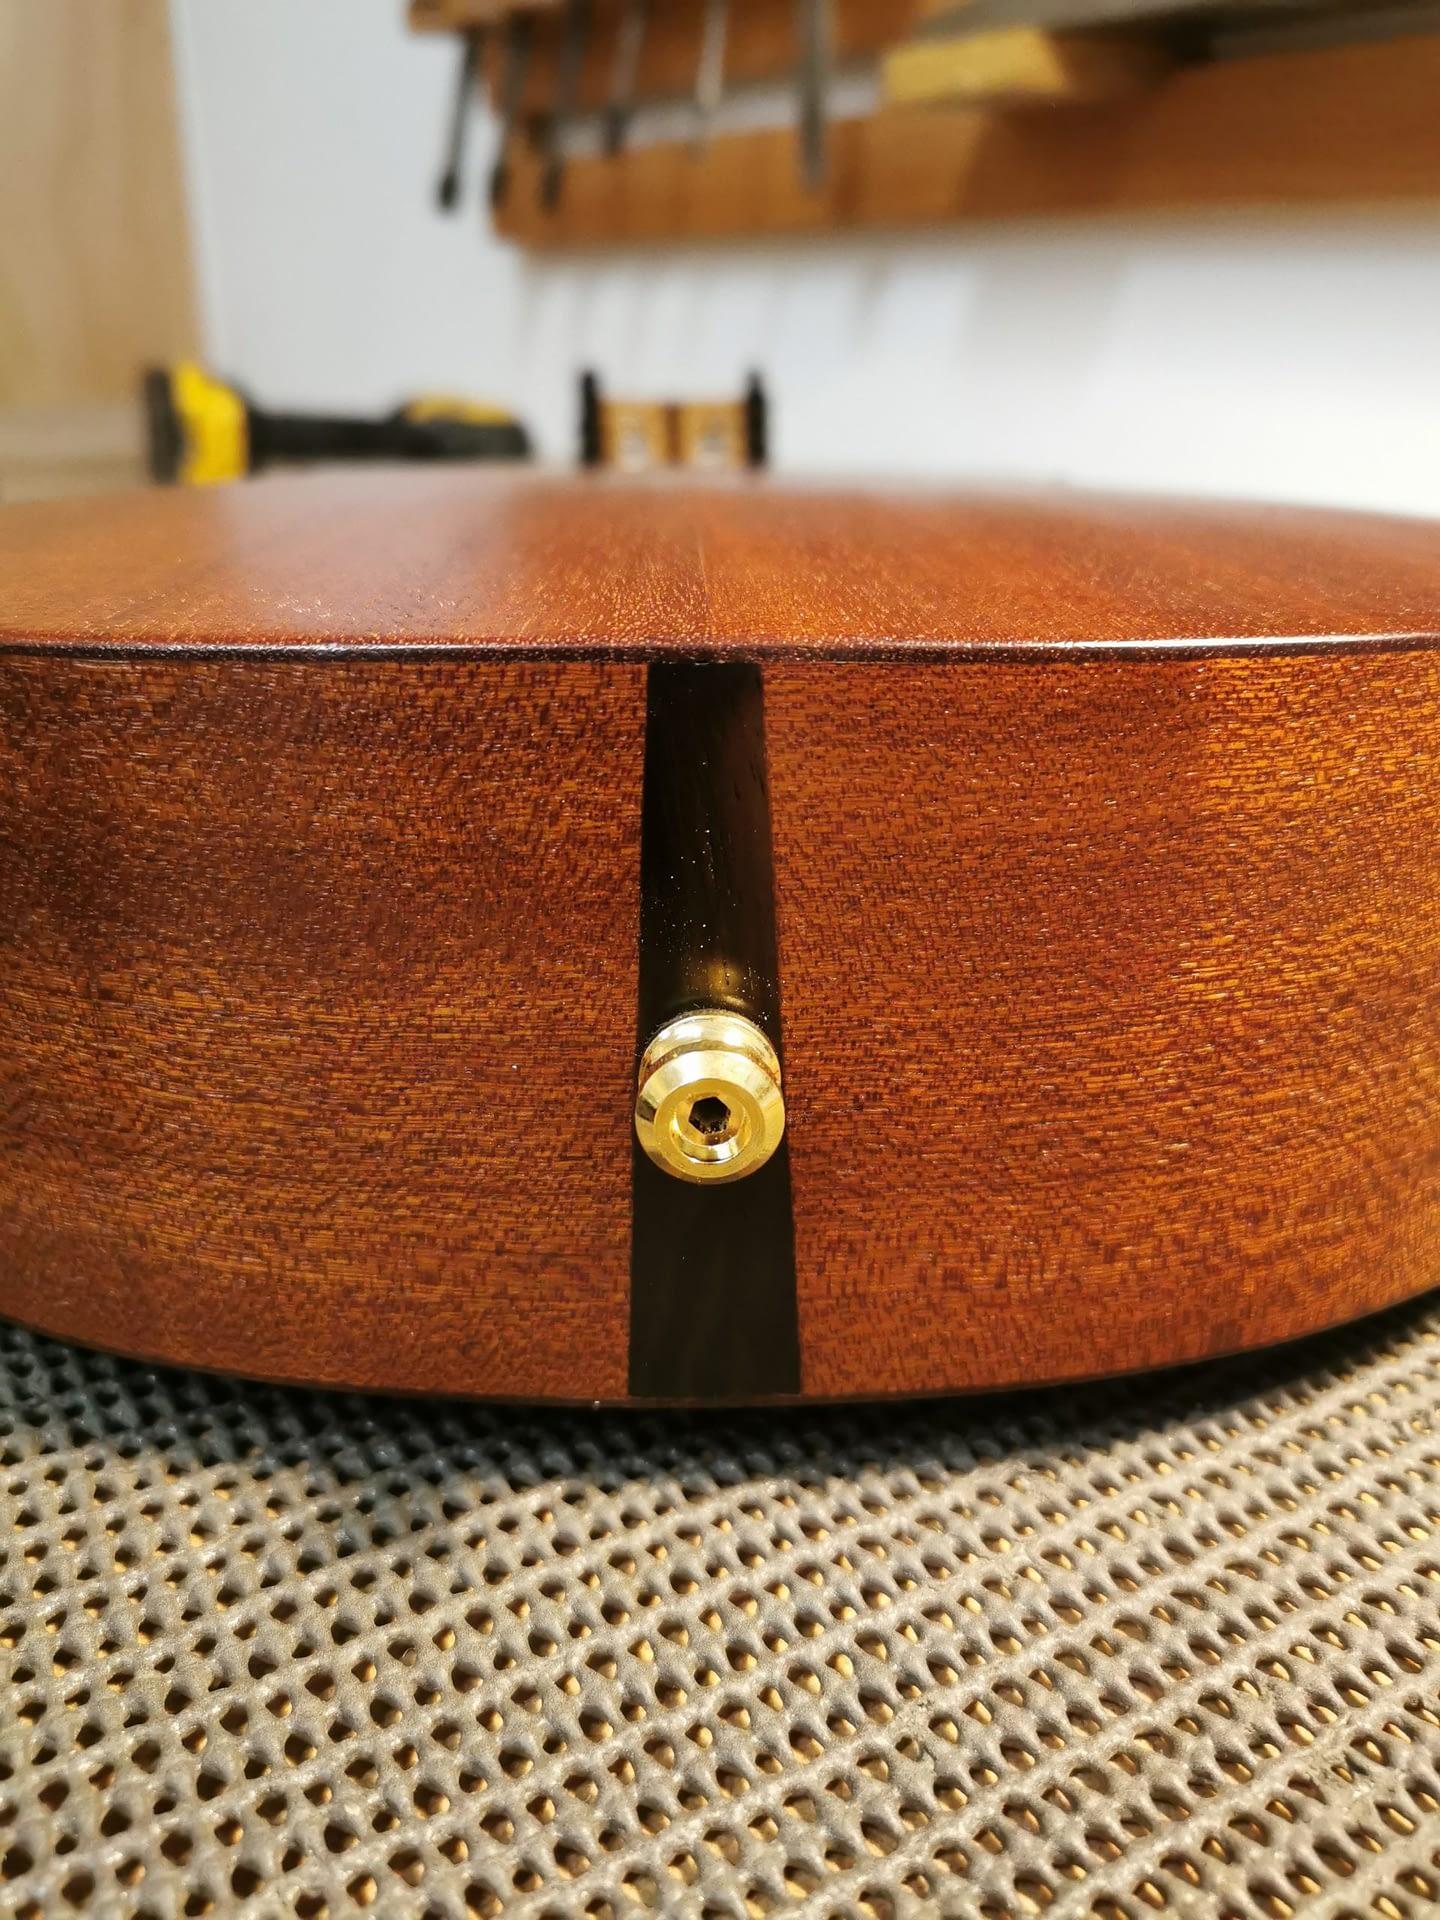 Handmade Ukulele Schaller Strap Lock Fitted guitar repair stroud